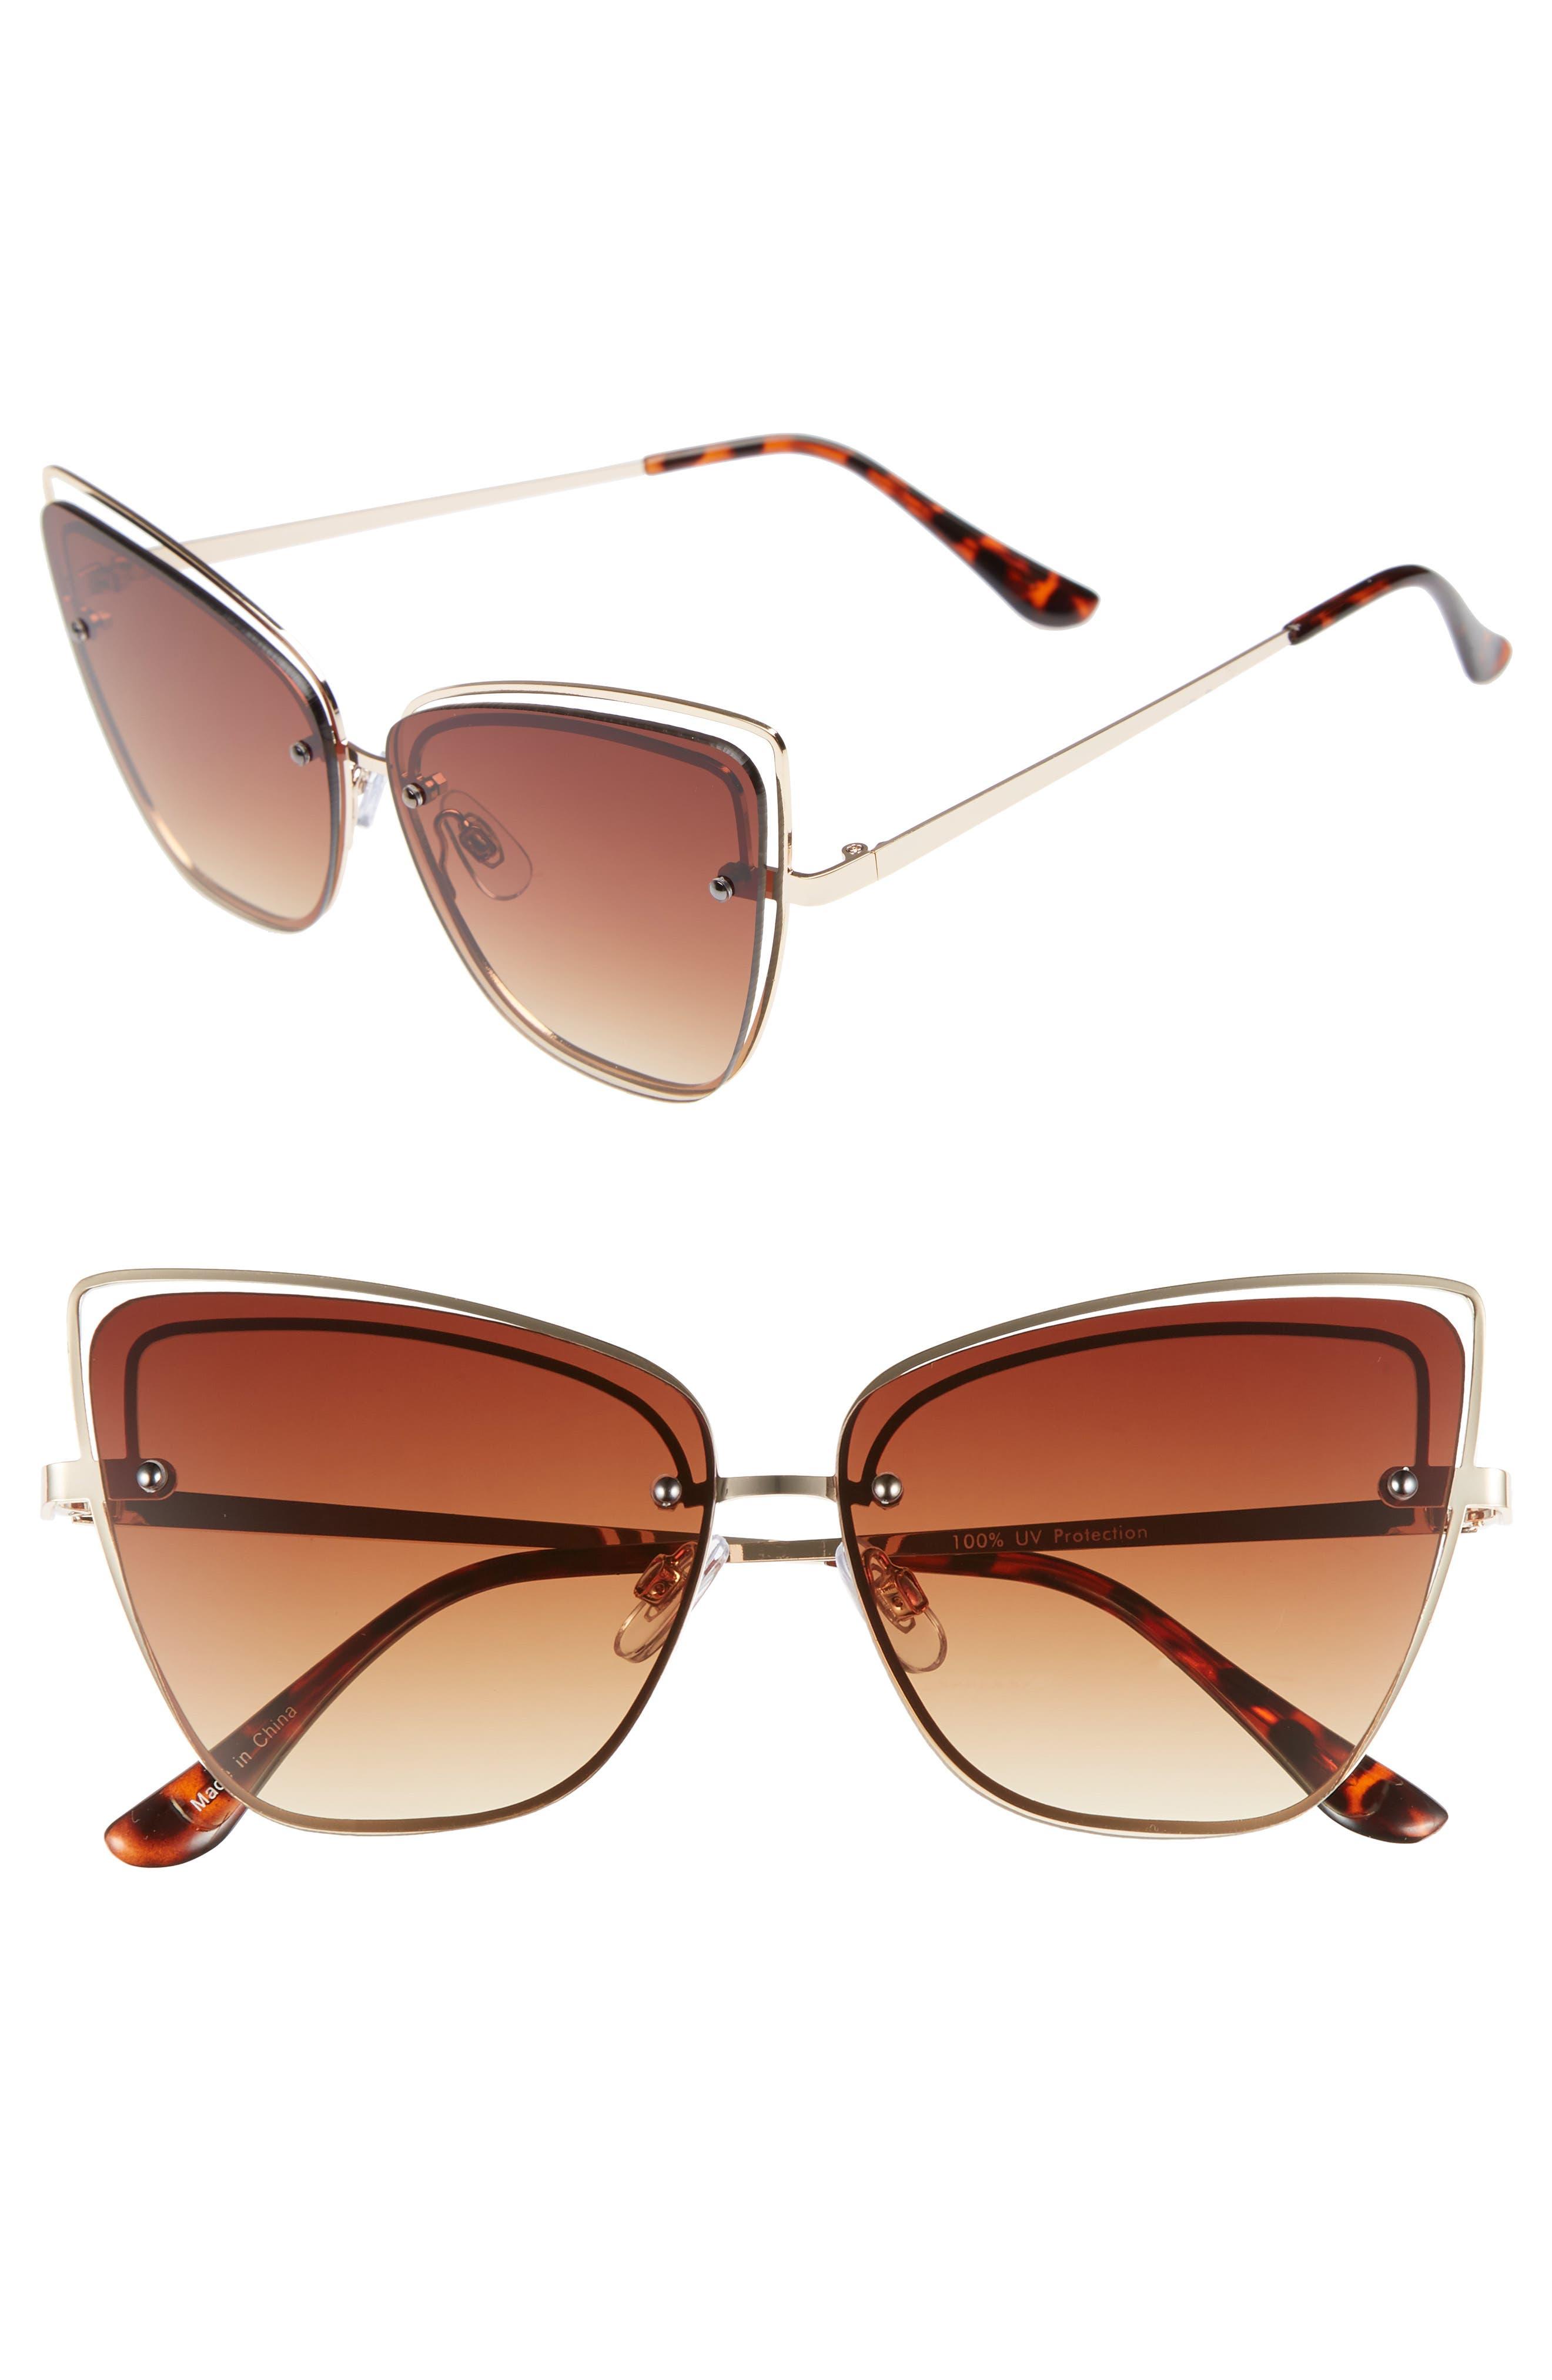 Main Image - BP. Dainty 53mm Rimless Cat Eye Sunglasses